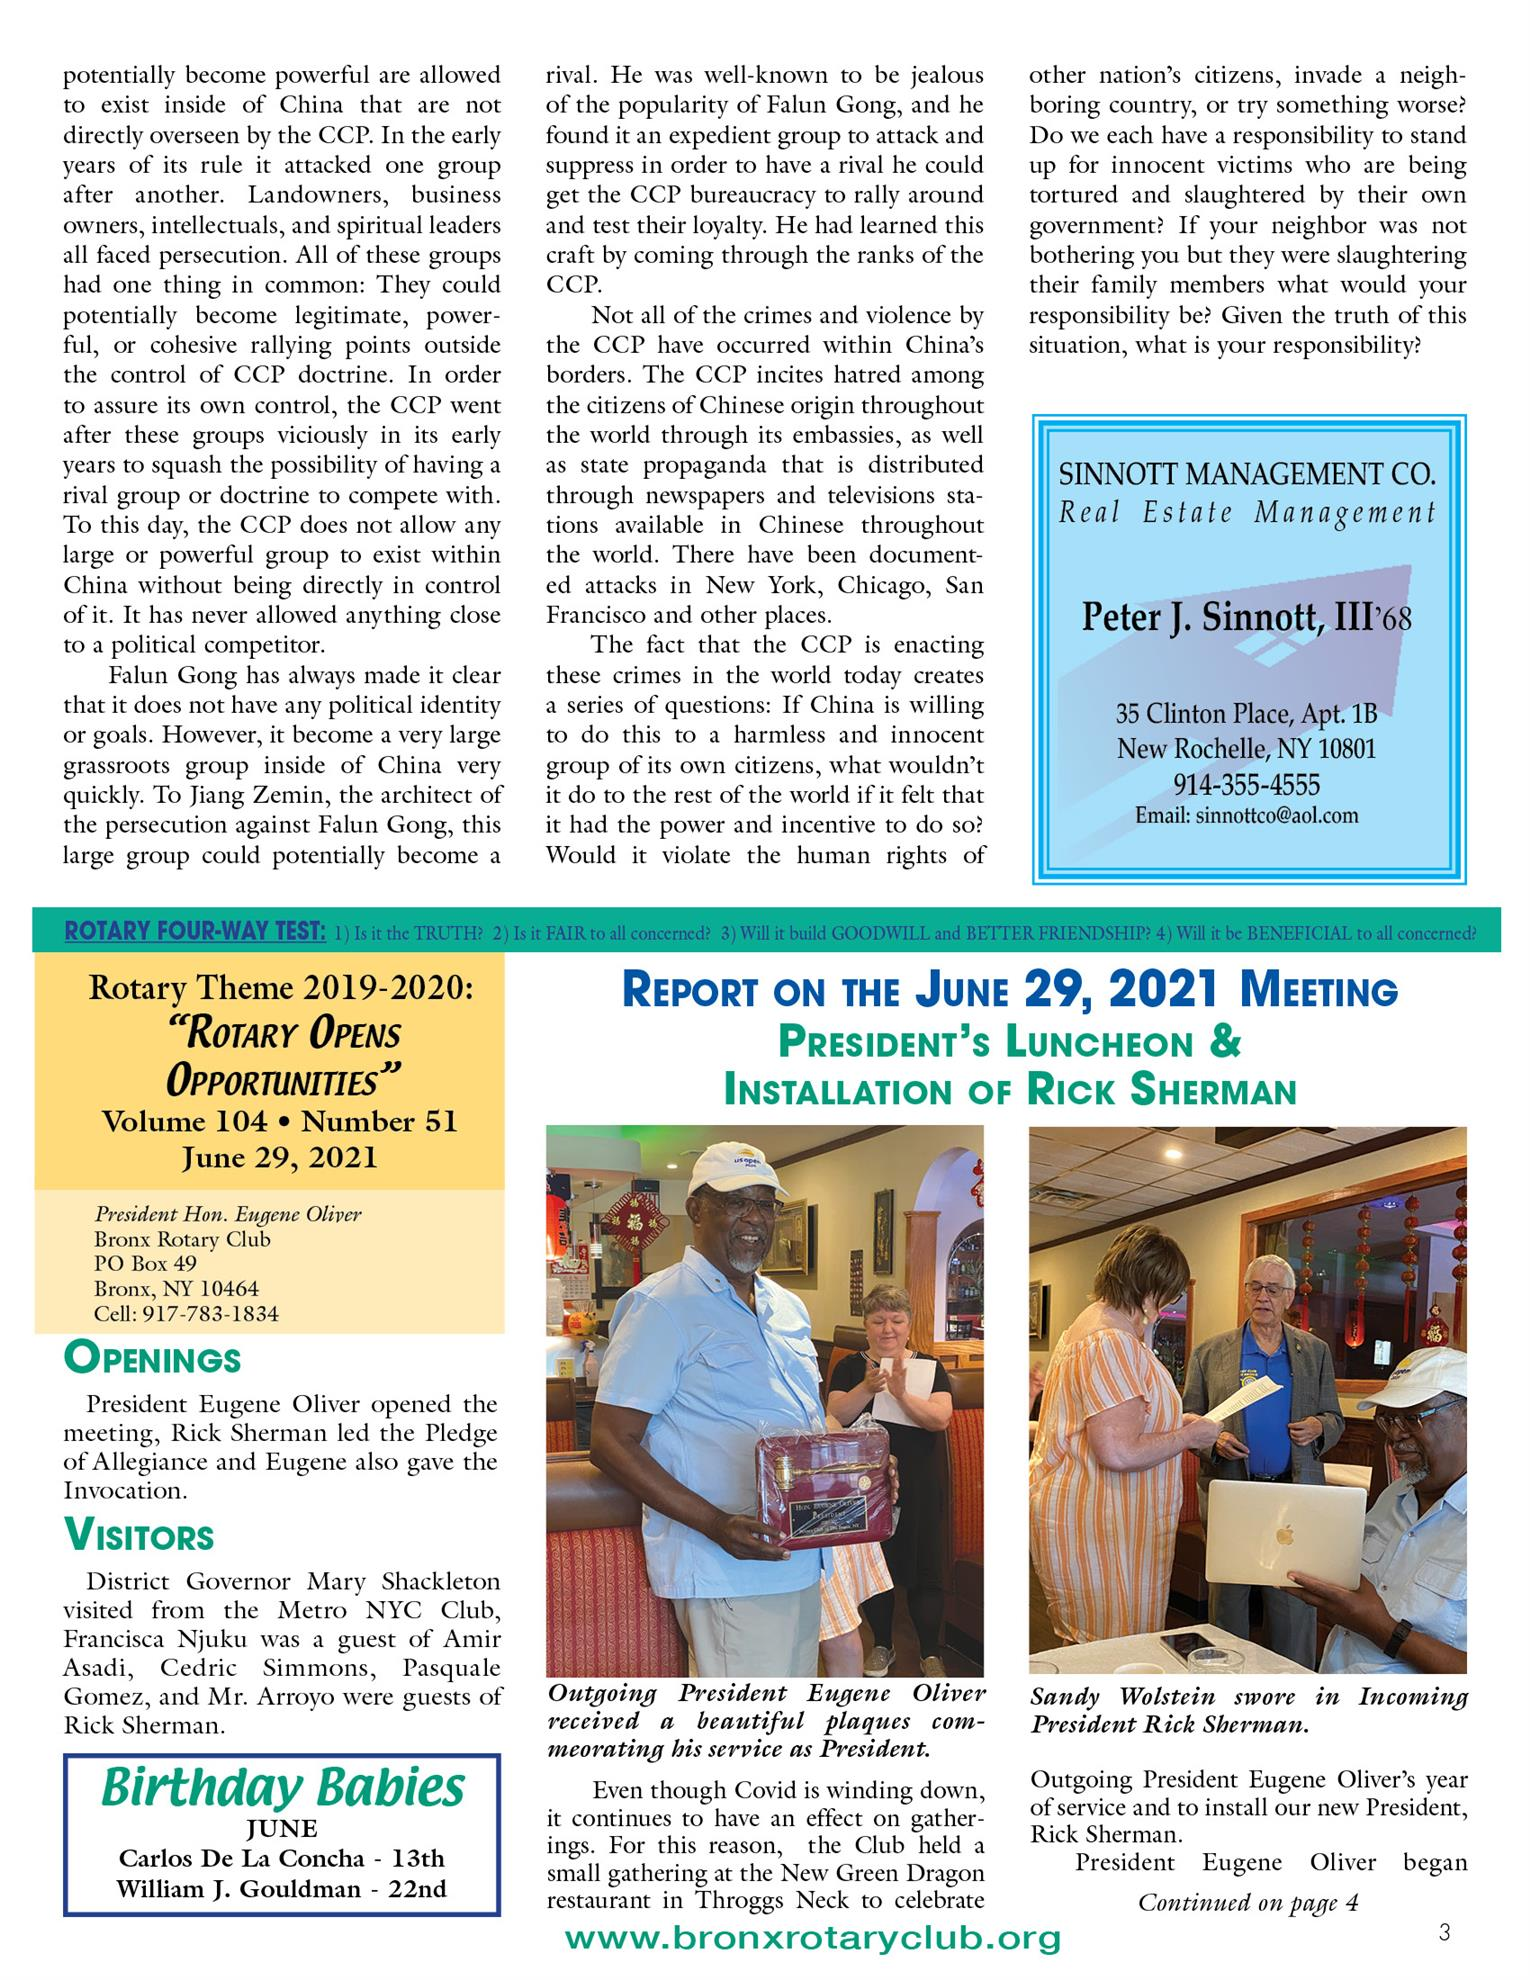 Tuesdays newsletter 6/15, 6/22 & 6/29/2021 p3